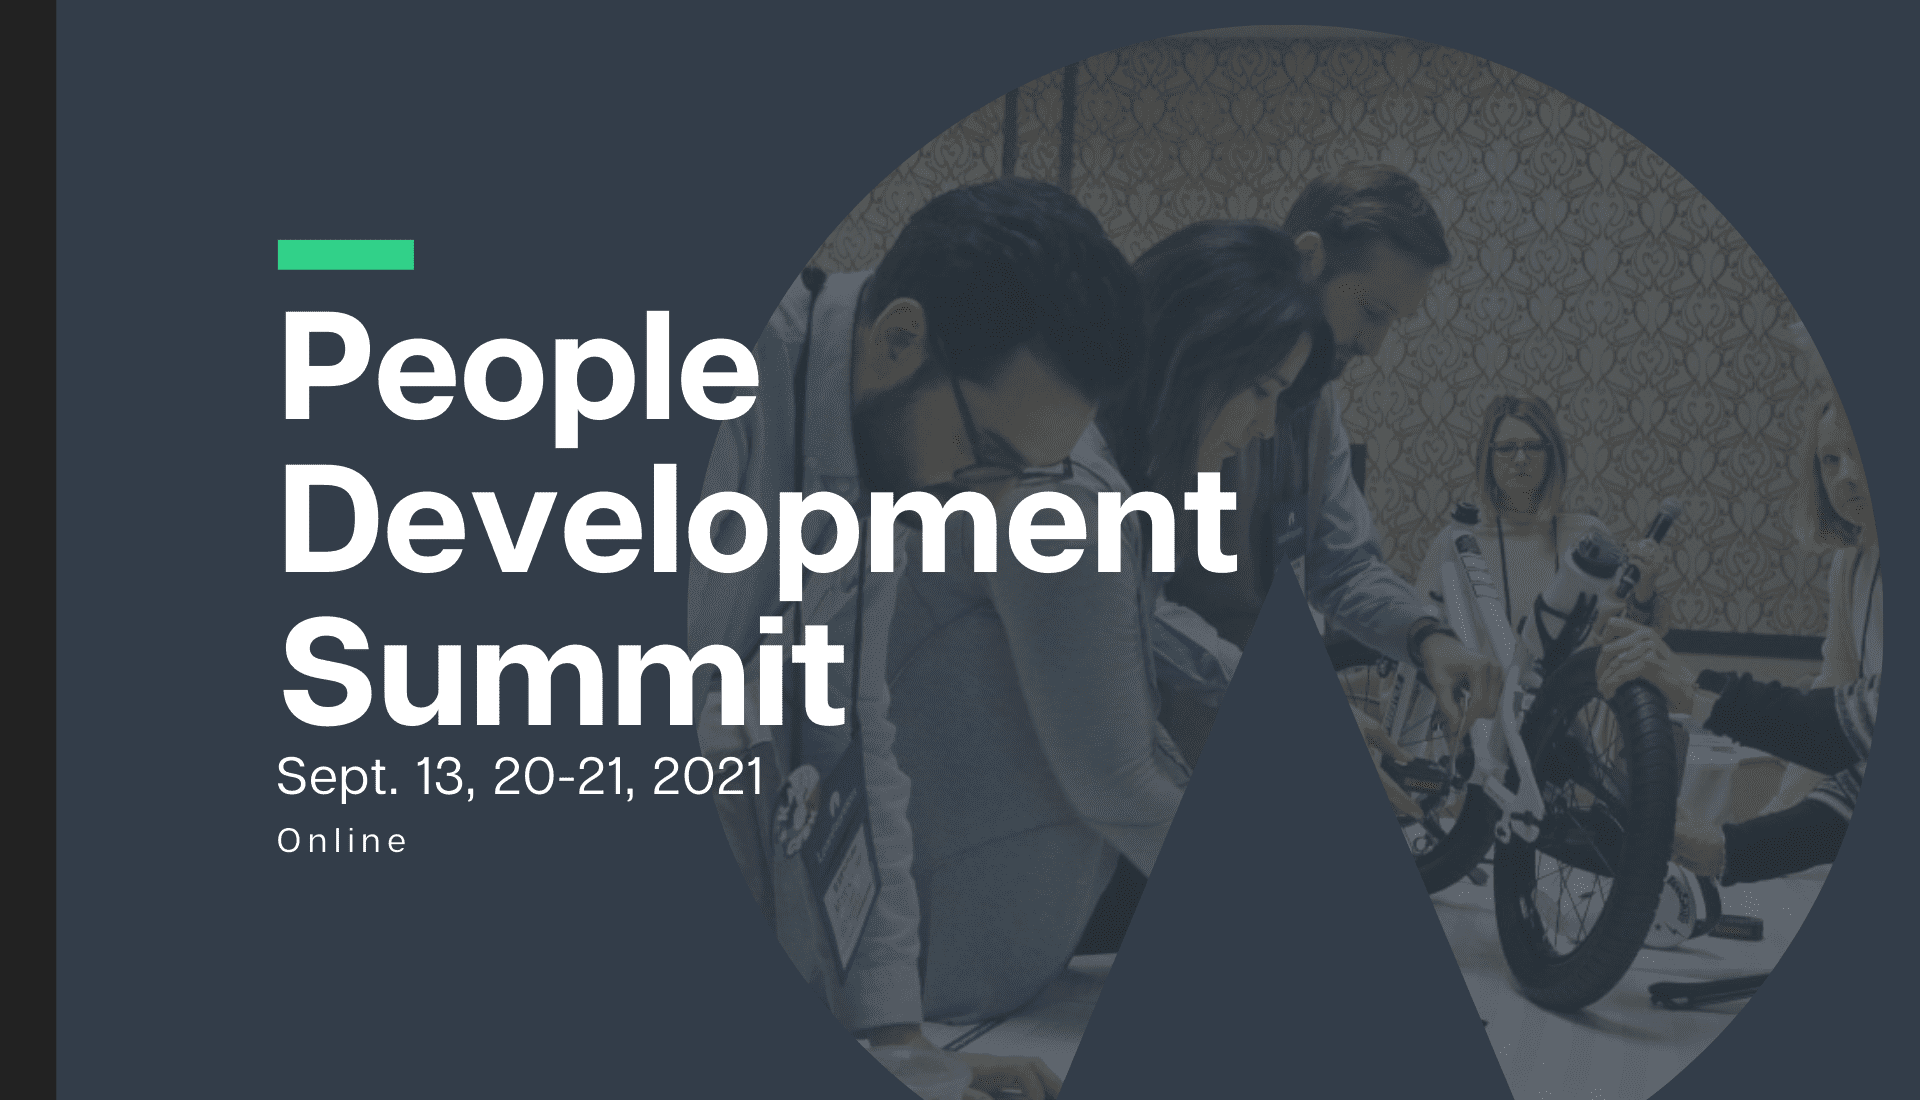 People Development Summit